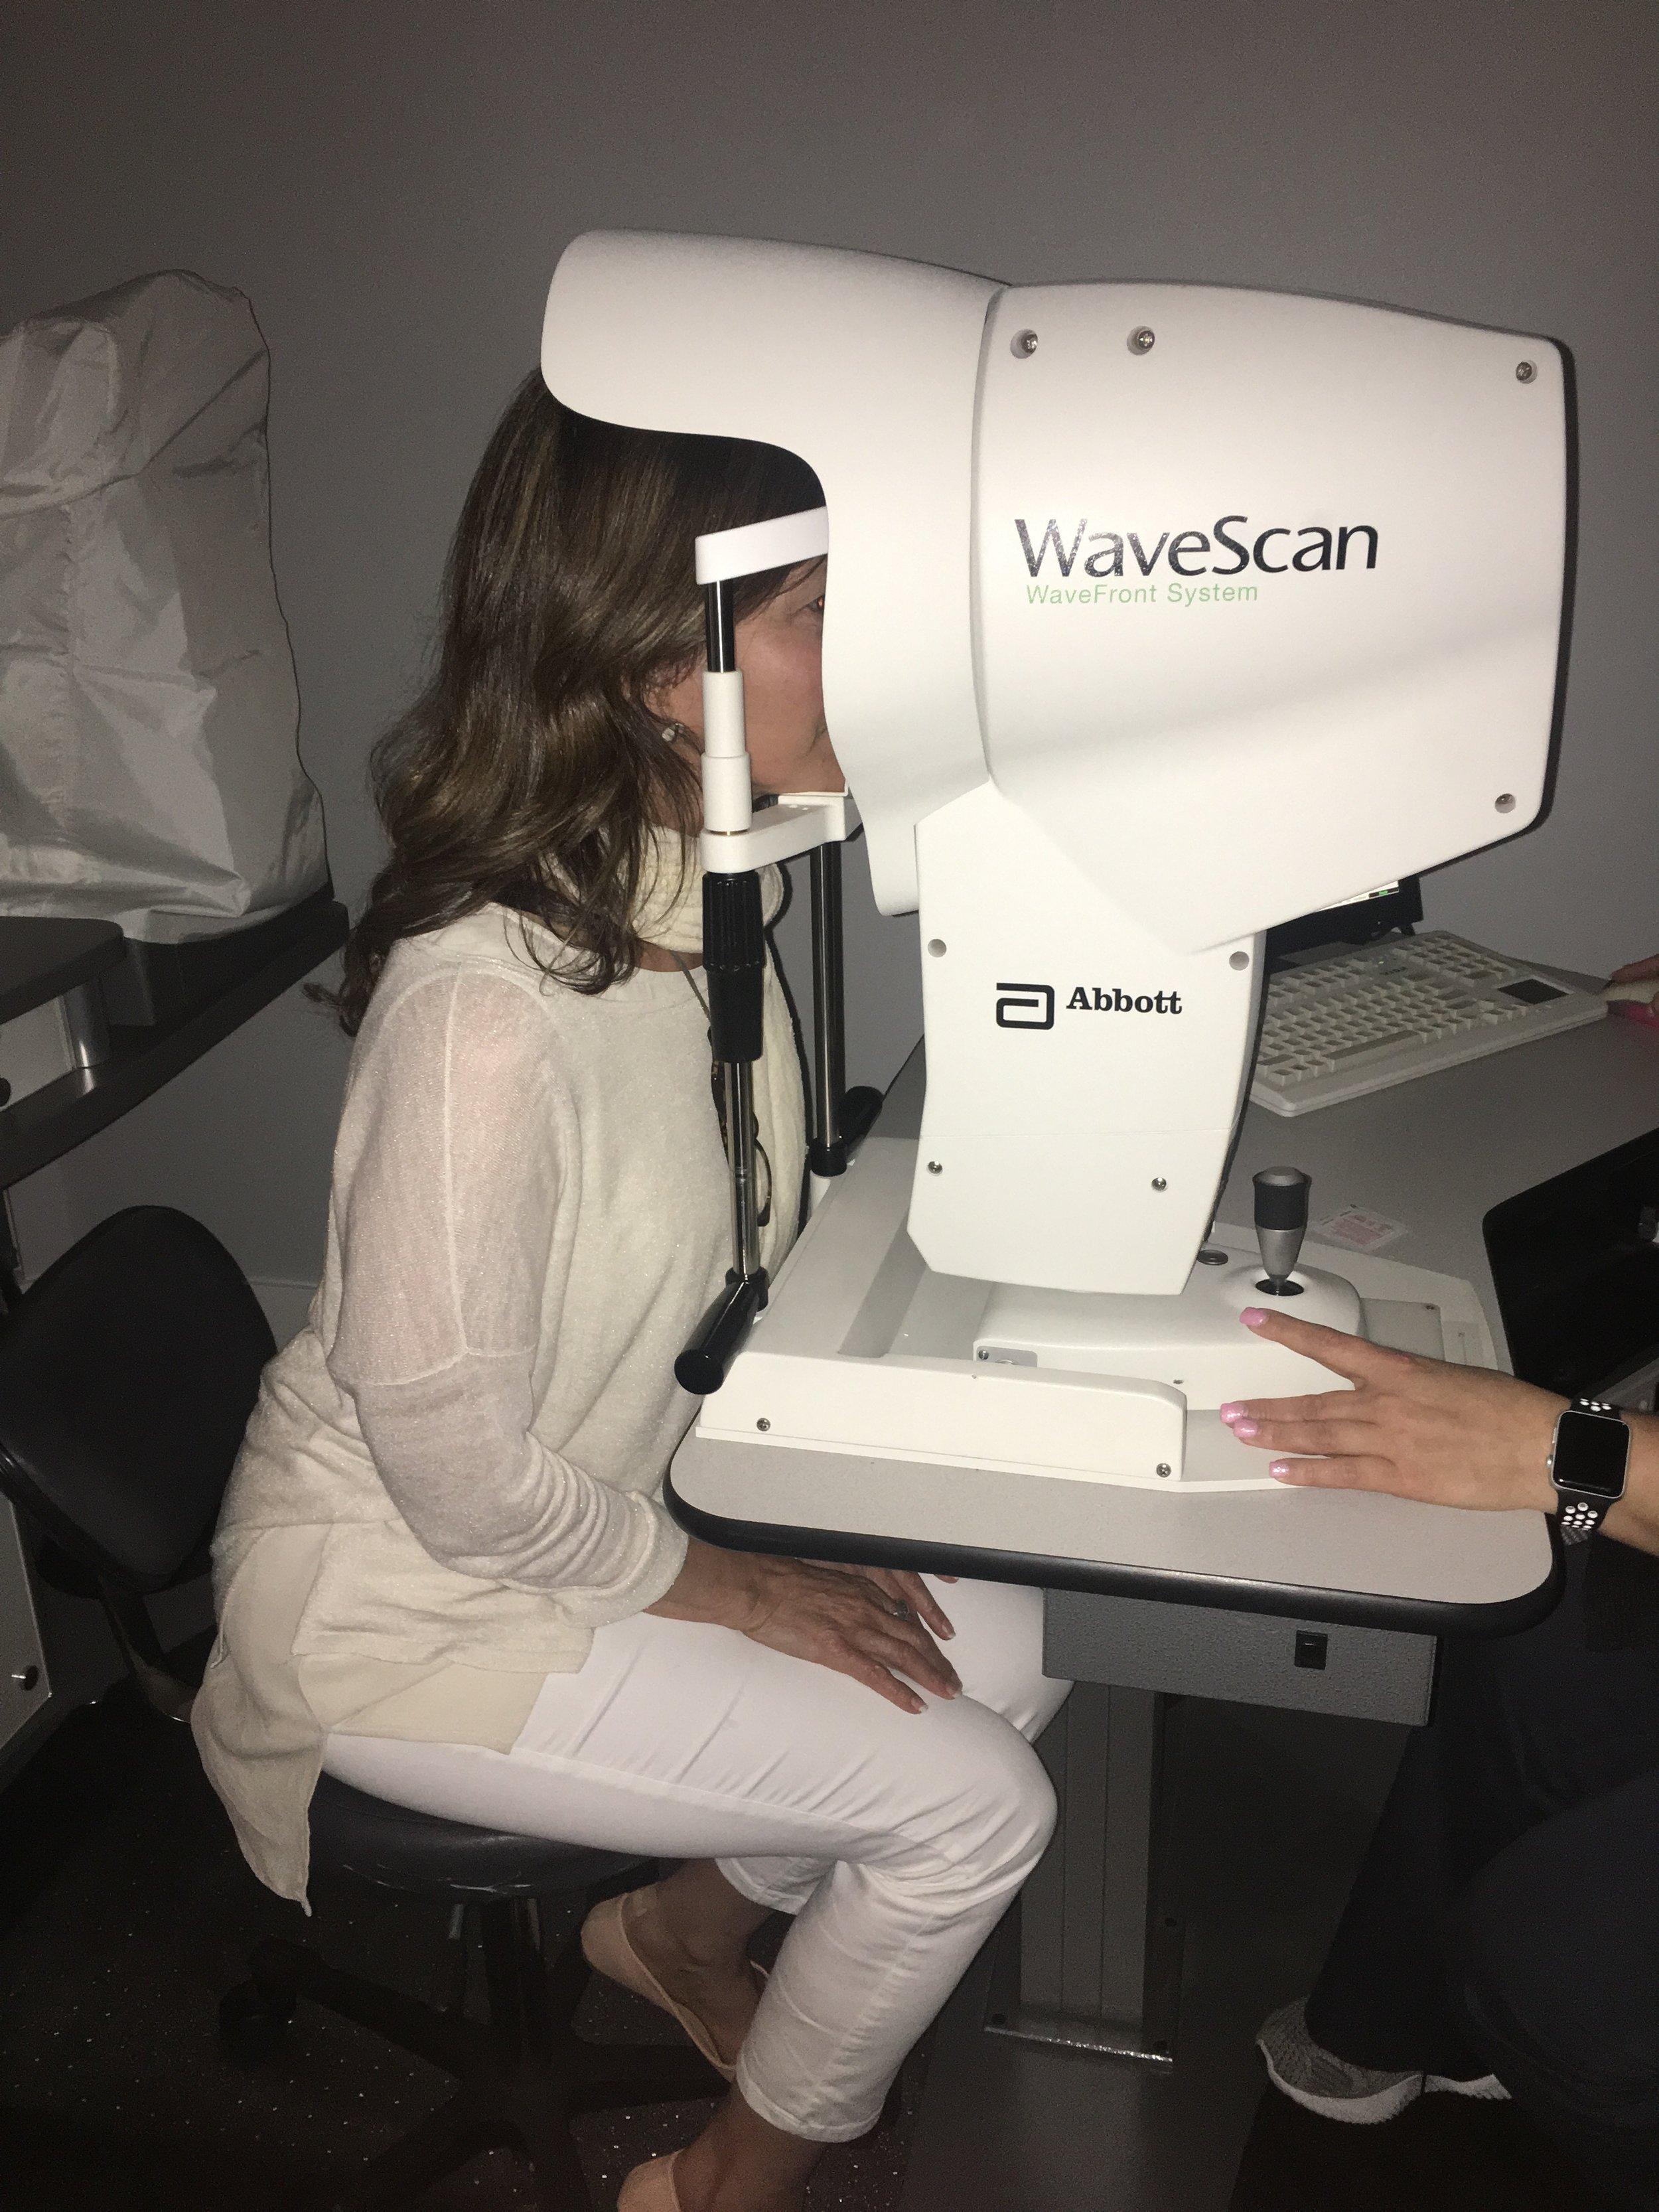 Using NASA telescope technology equipment to record advanced eye measurements